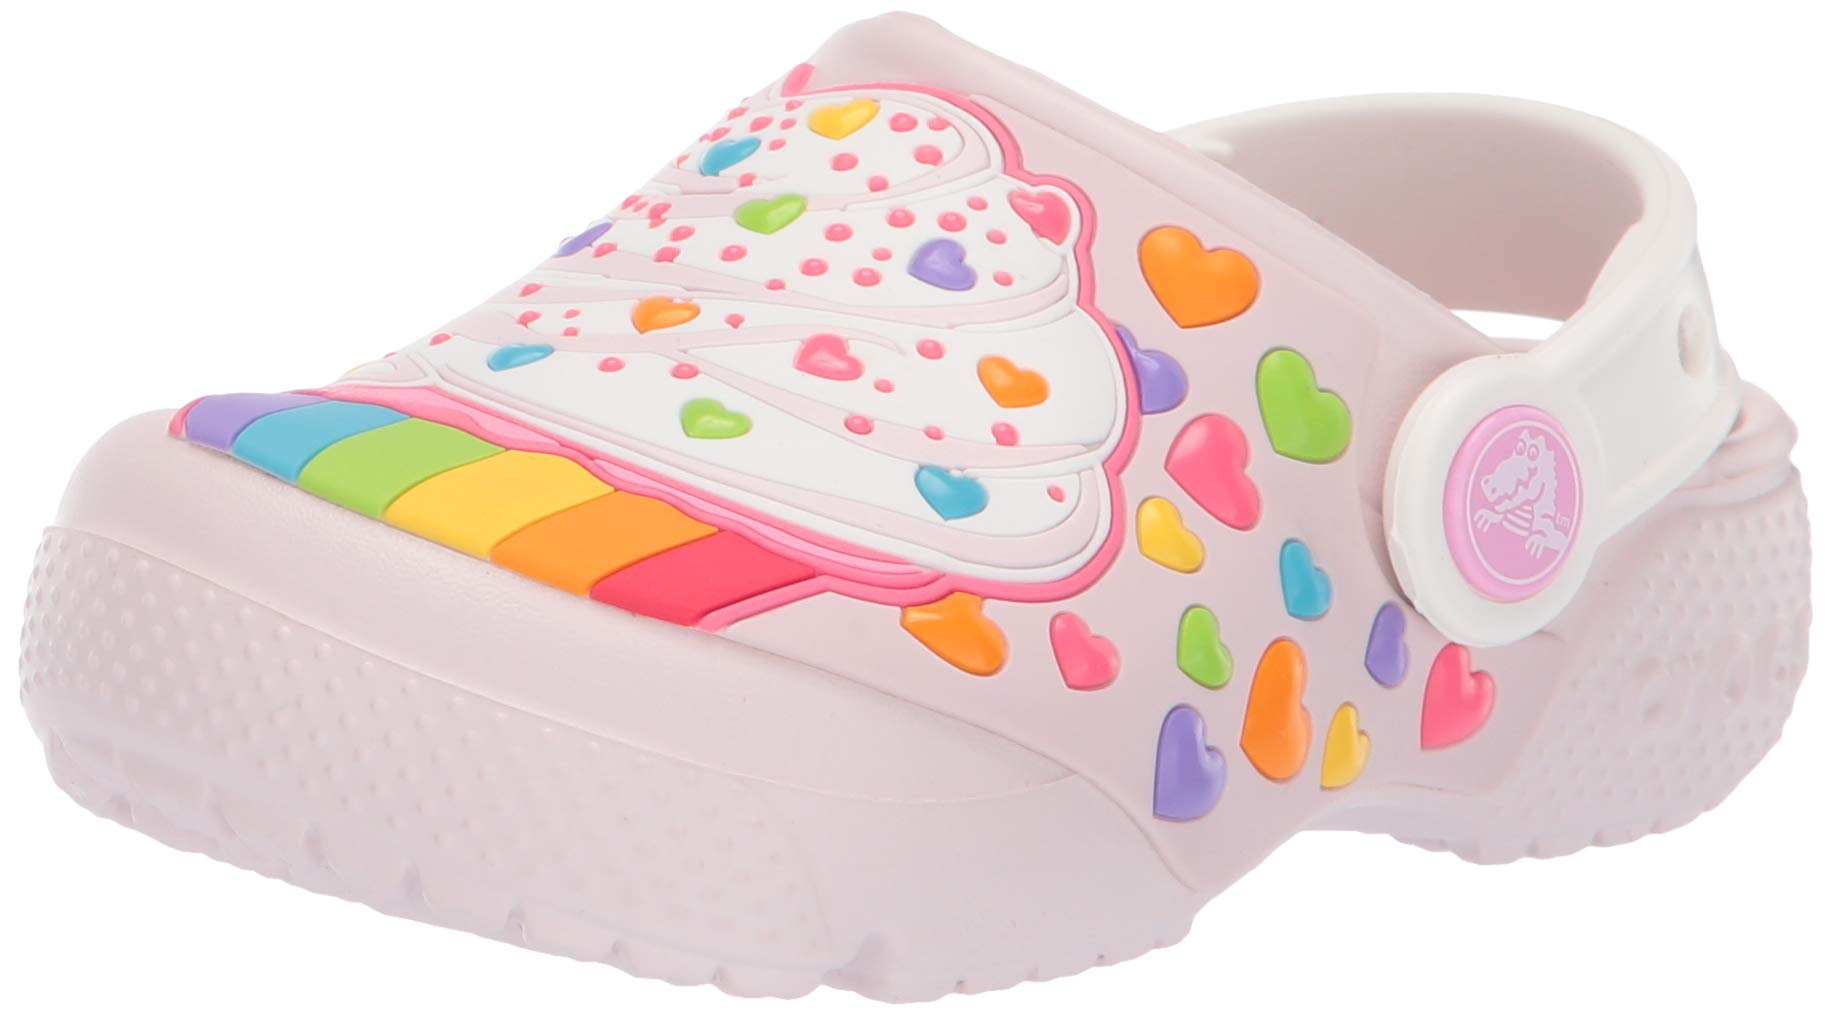 Crocs Kids' Fun Lab Cupcake Clog, Barely Pink, 13 M US Little Kid by Crocs